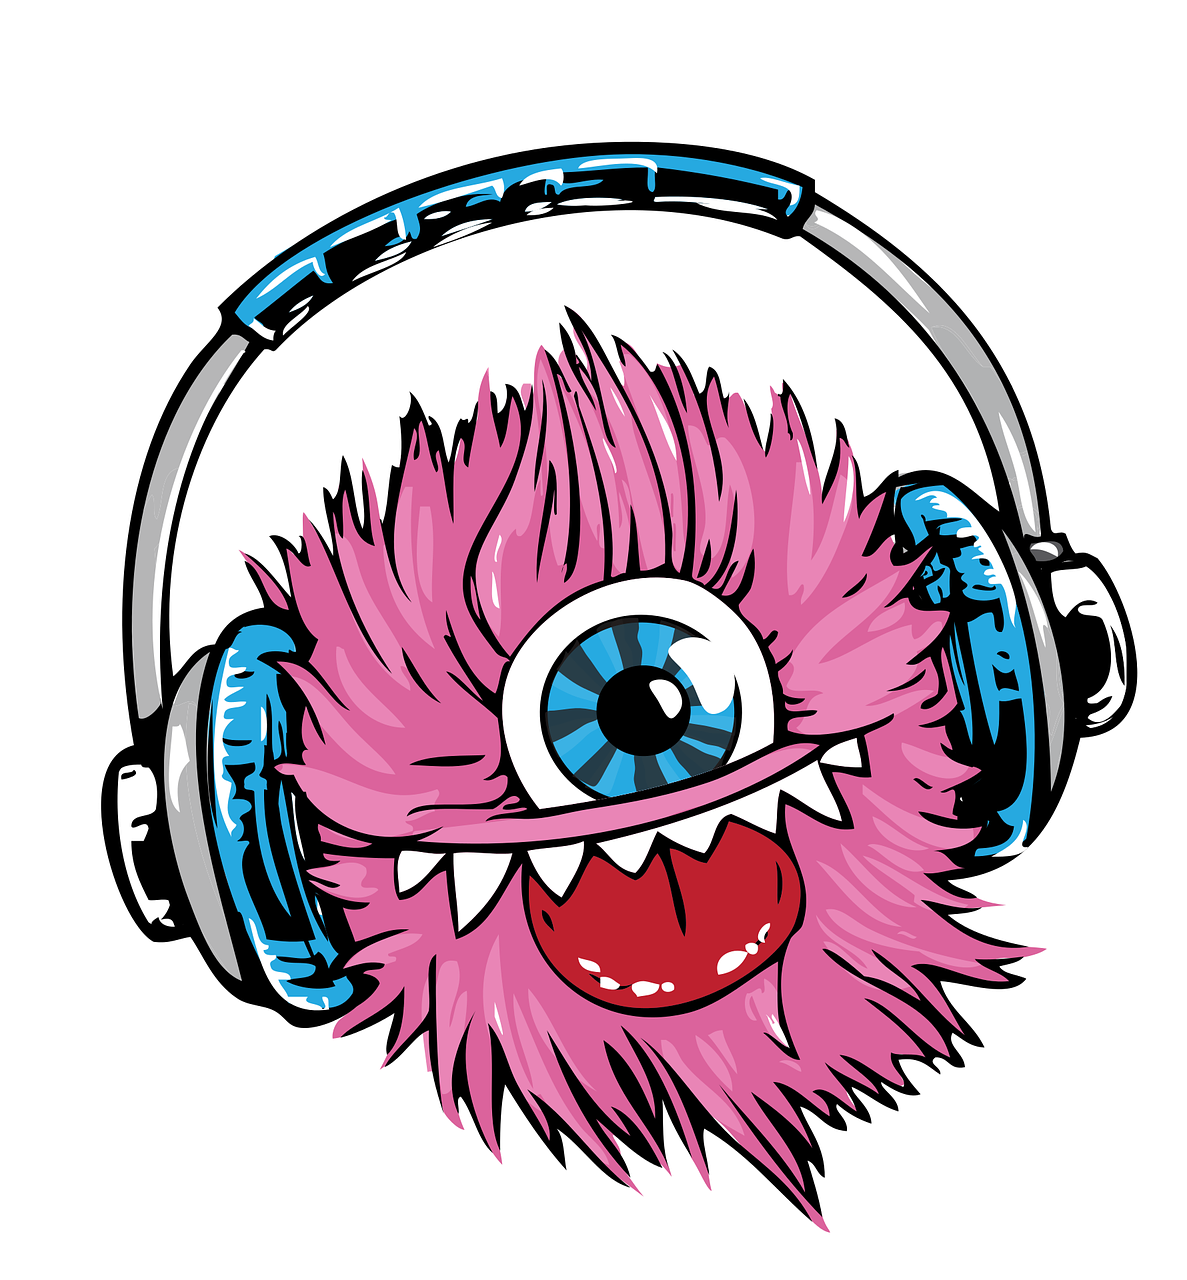 Headphones clipart illustration. Monster headset transparent image